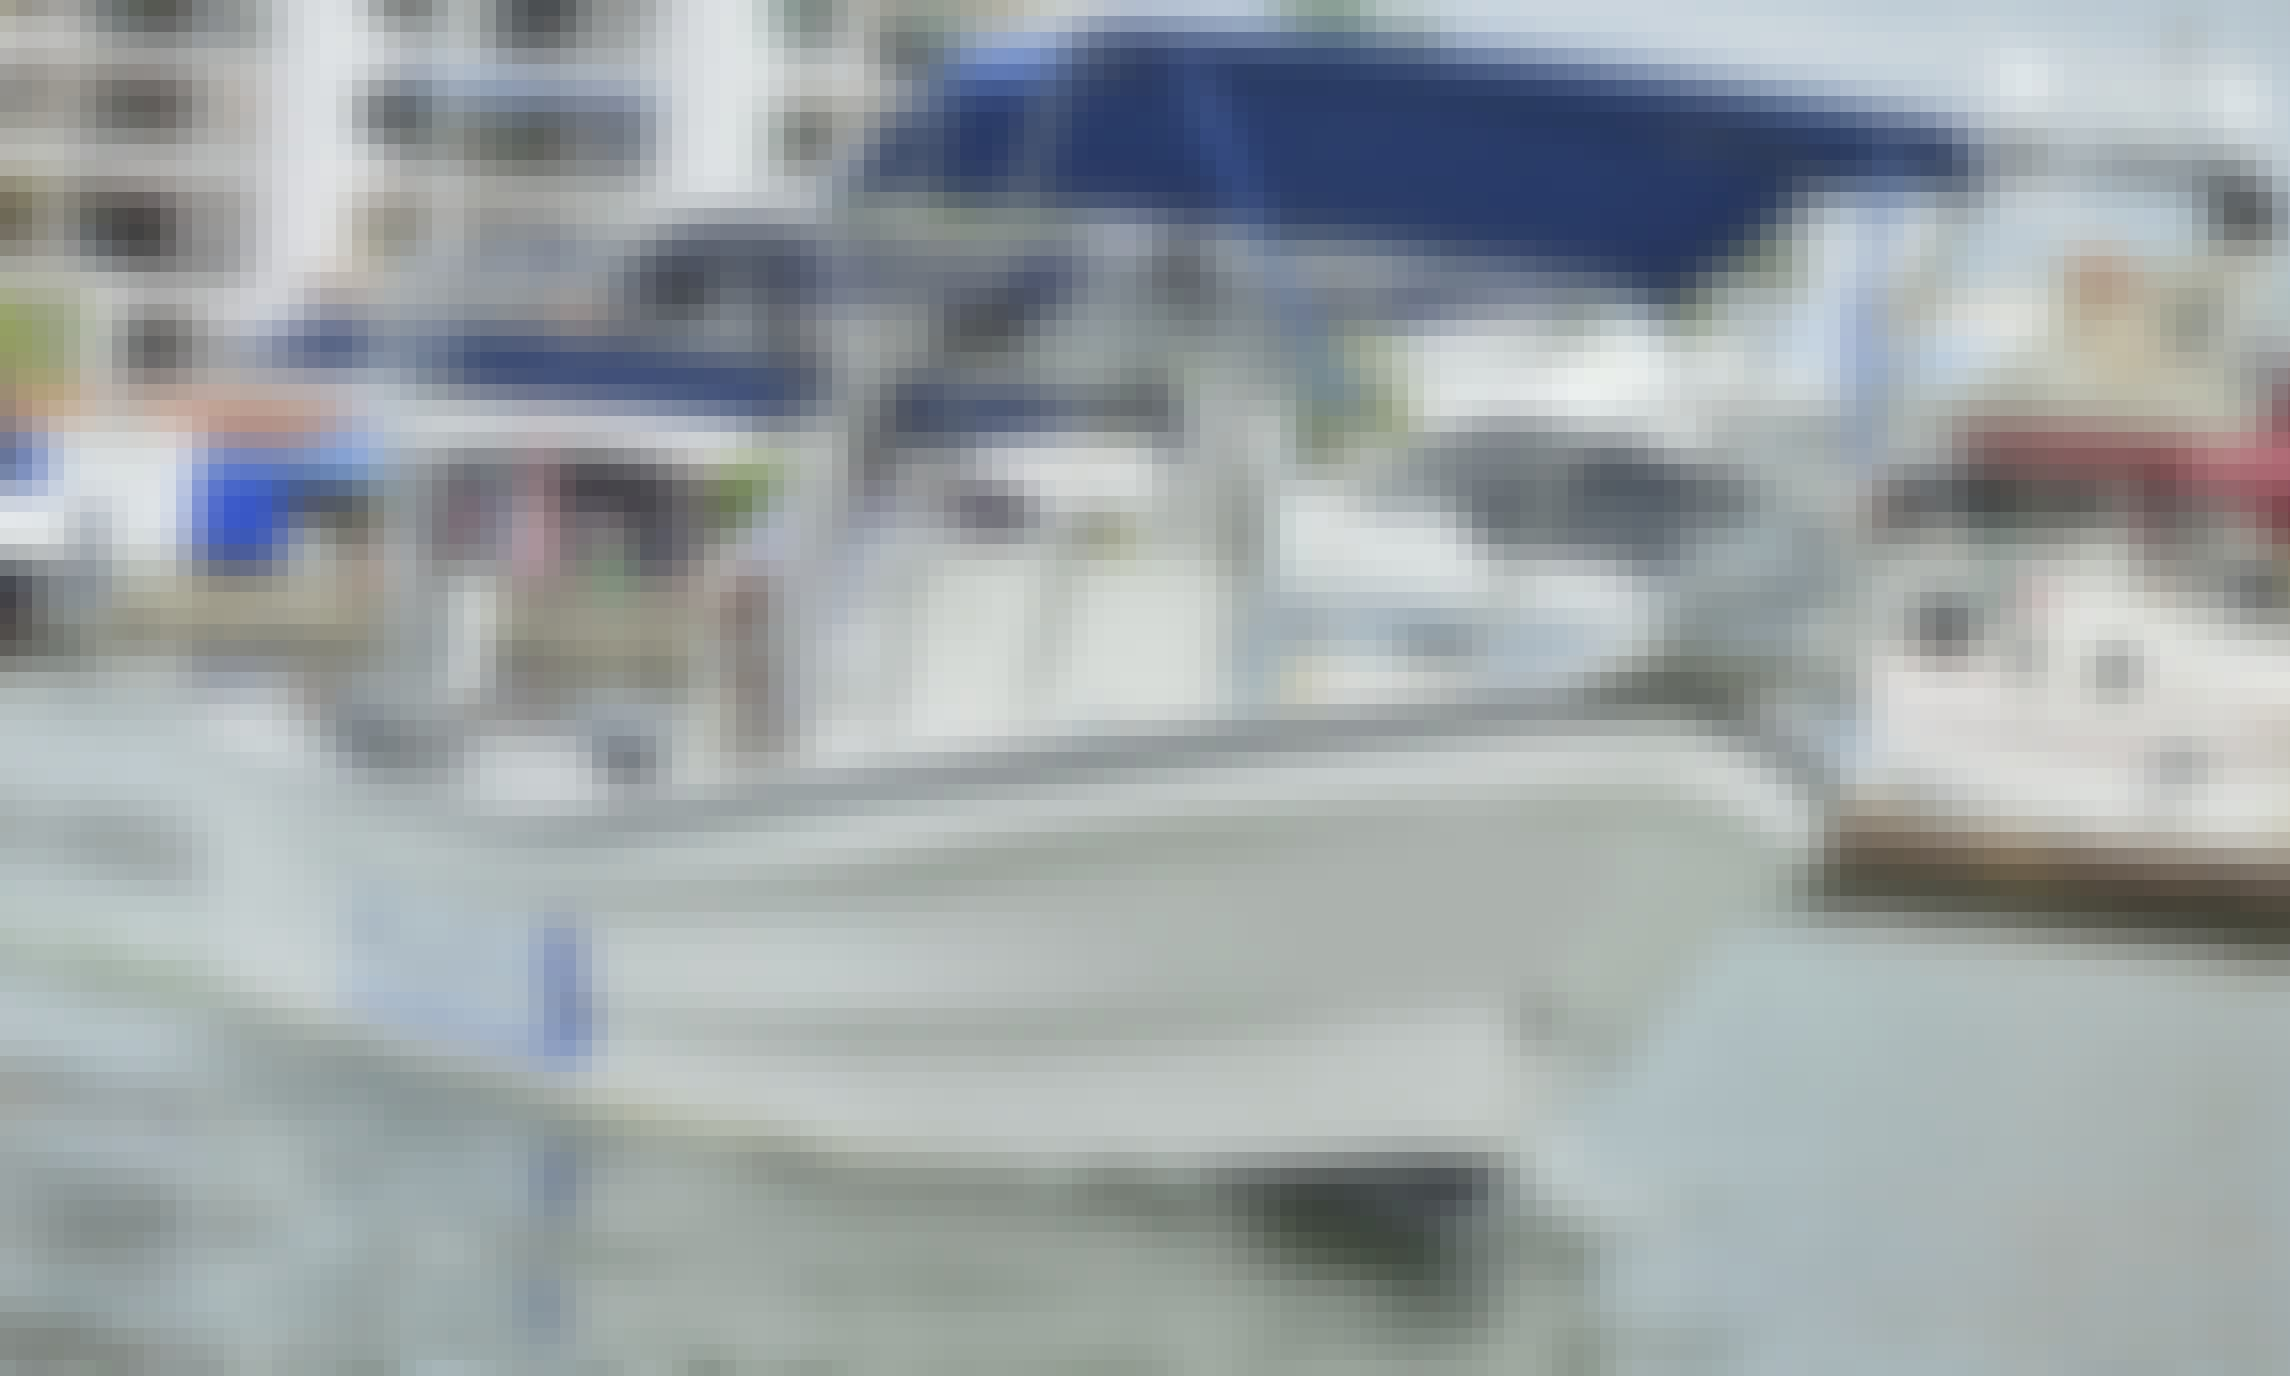 Super Panga Dinghy 27' Powerboat with 2 Mercury 60hp